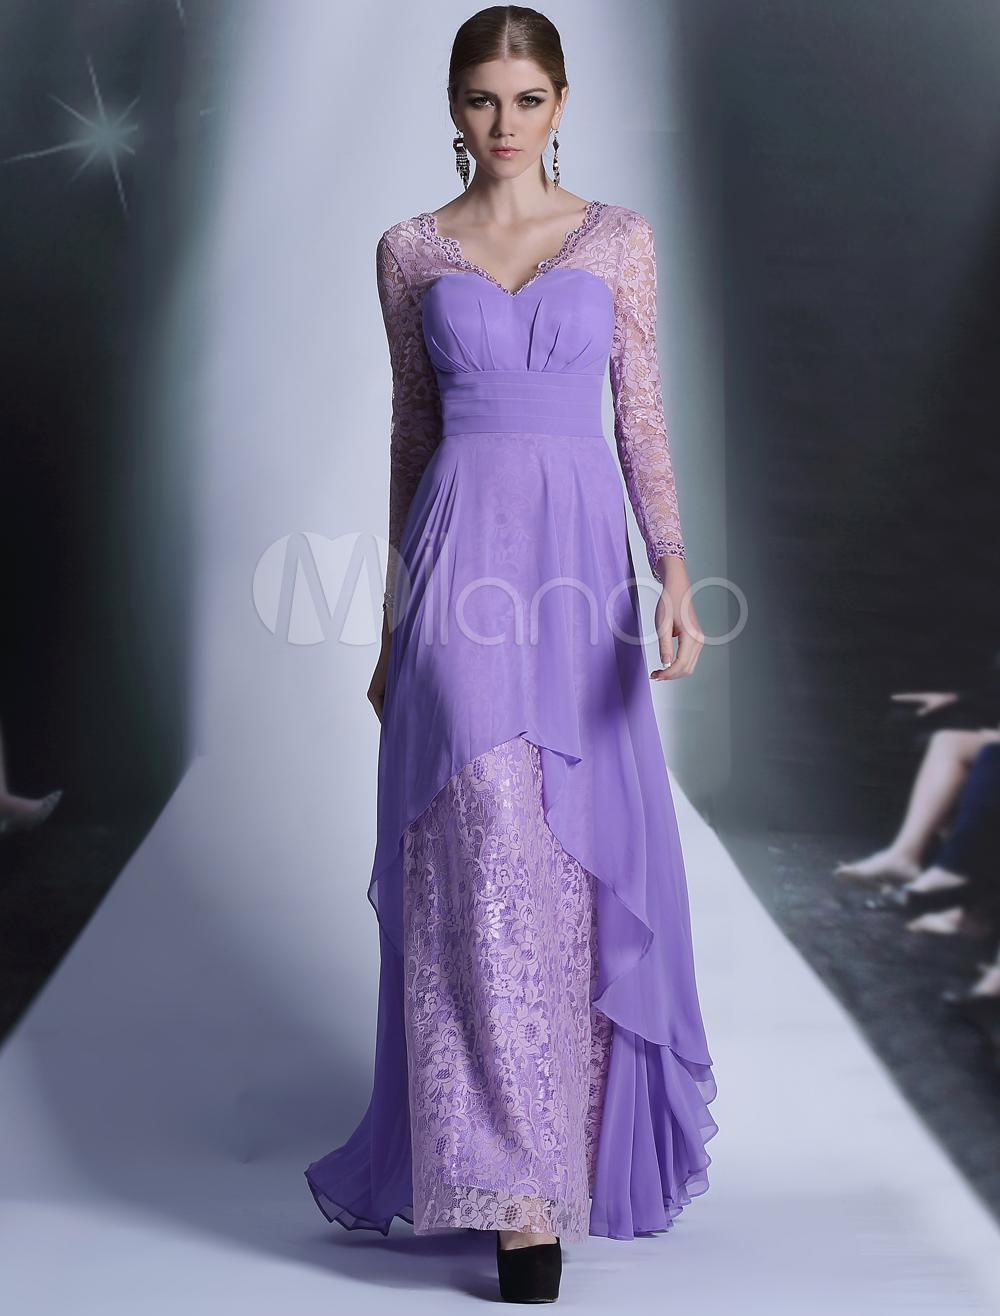 Vestido de noche de chifón de color lila de manga larga con escote ...